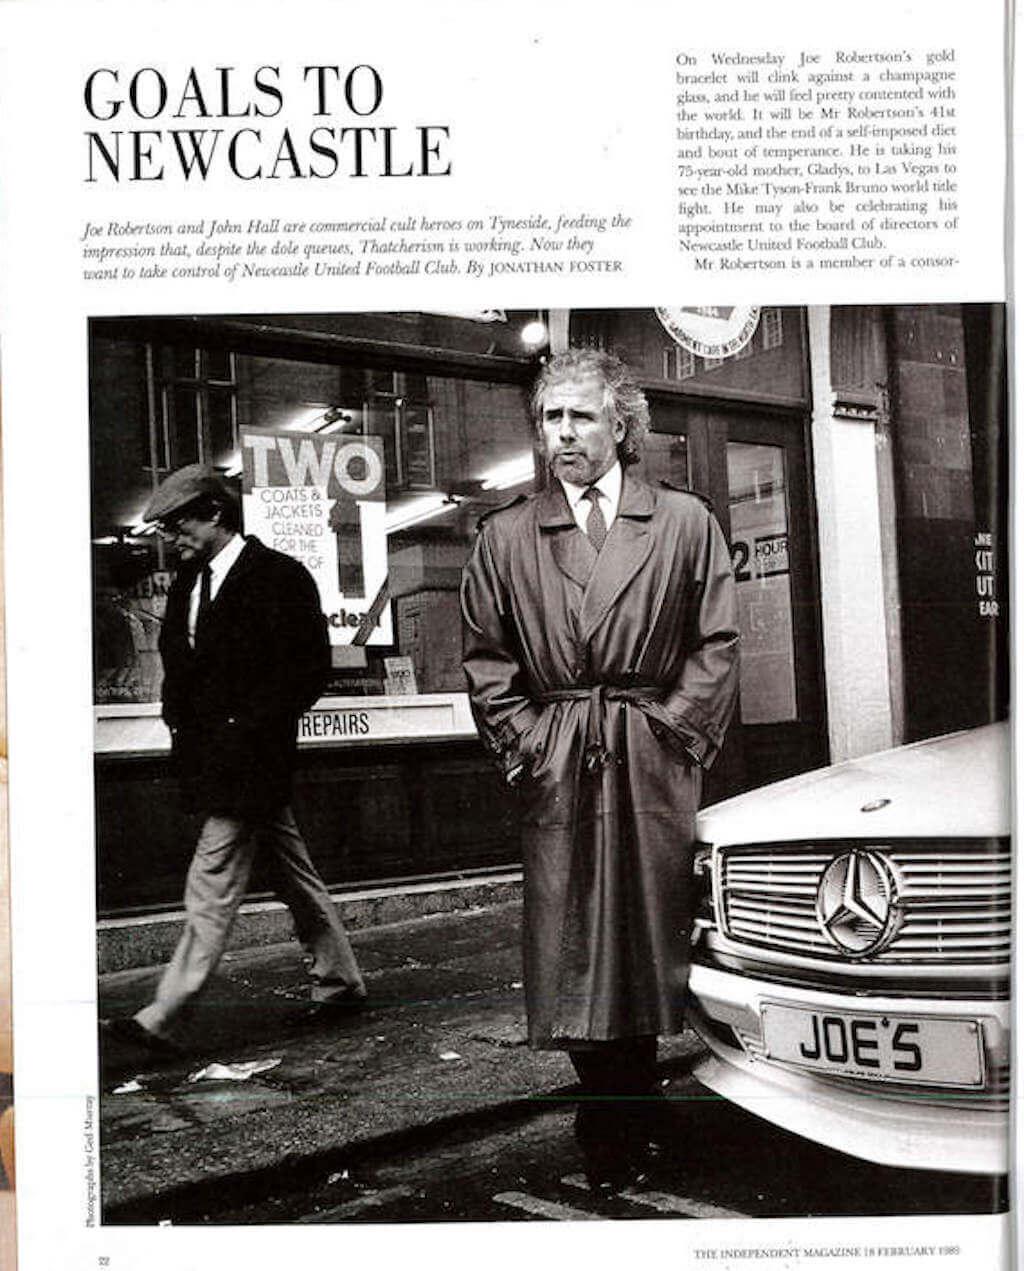 Joe Robertson Goals to Newcastle News Article 1